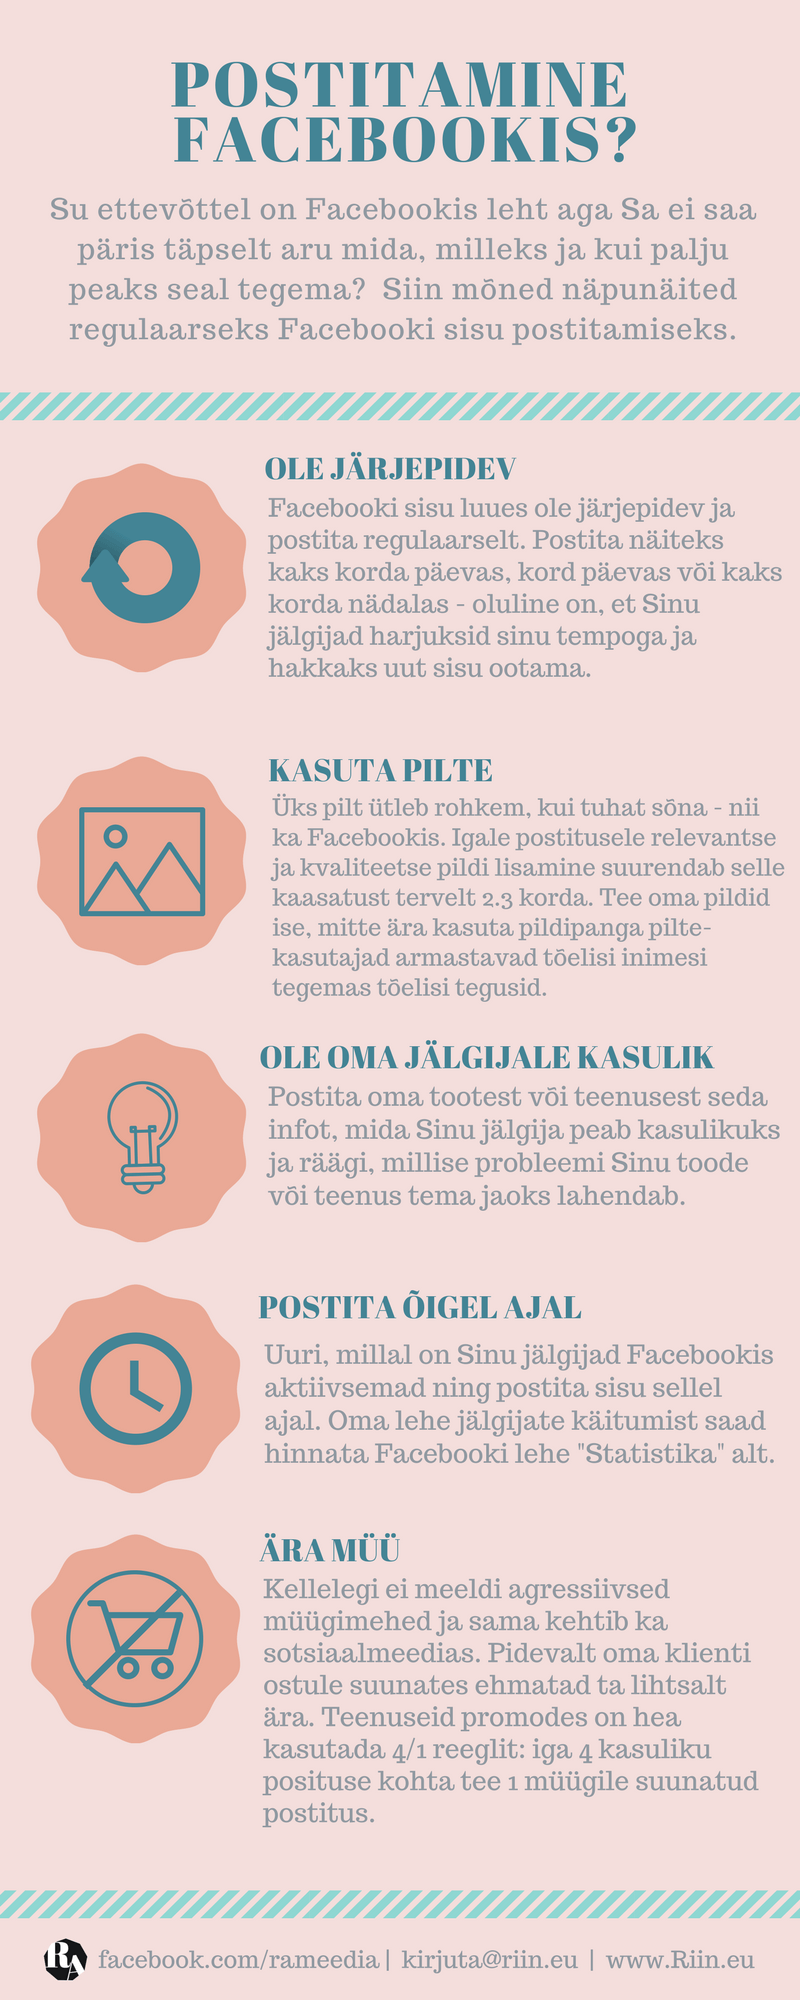 Riin.eu - Postitada Facebookis- Infograafika